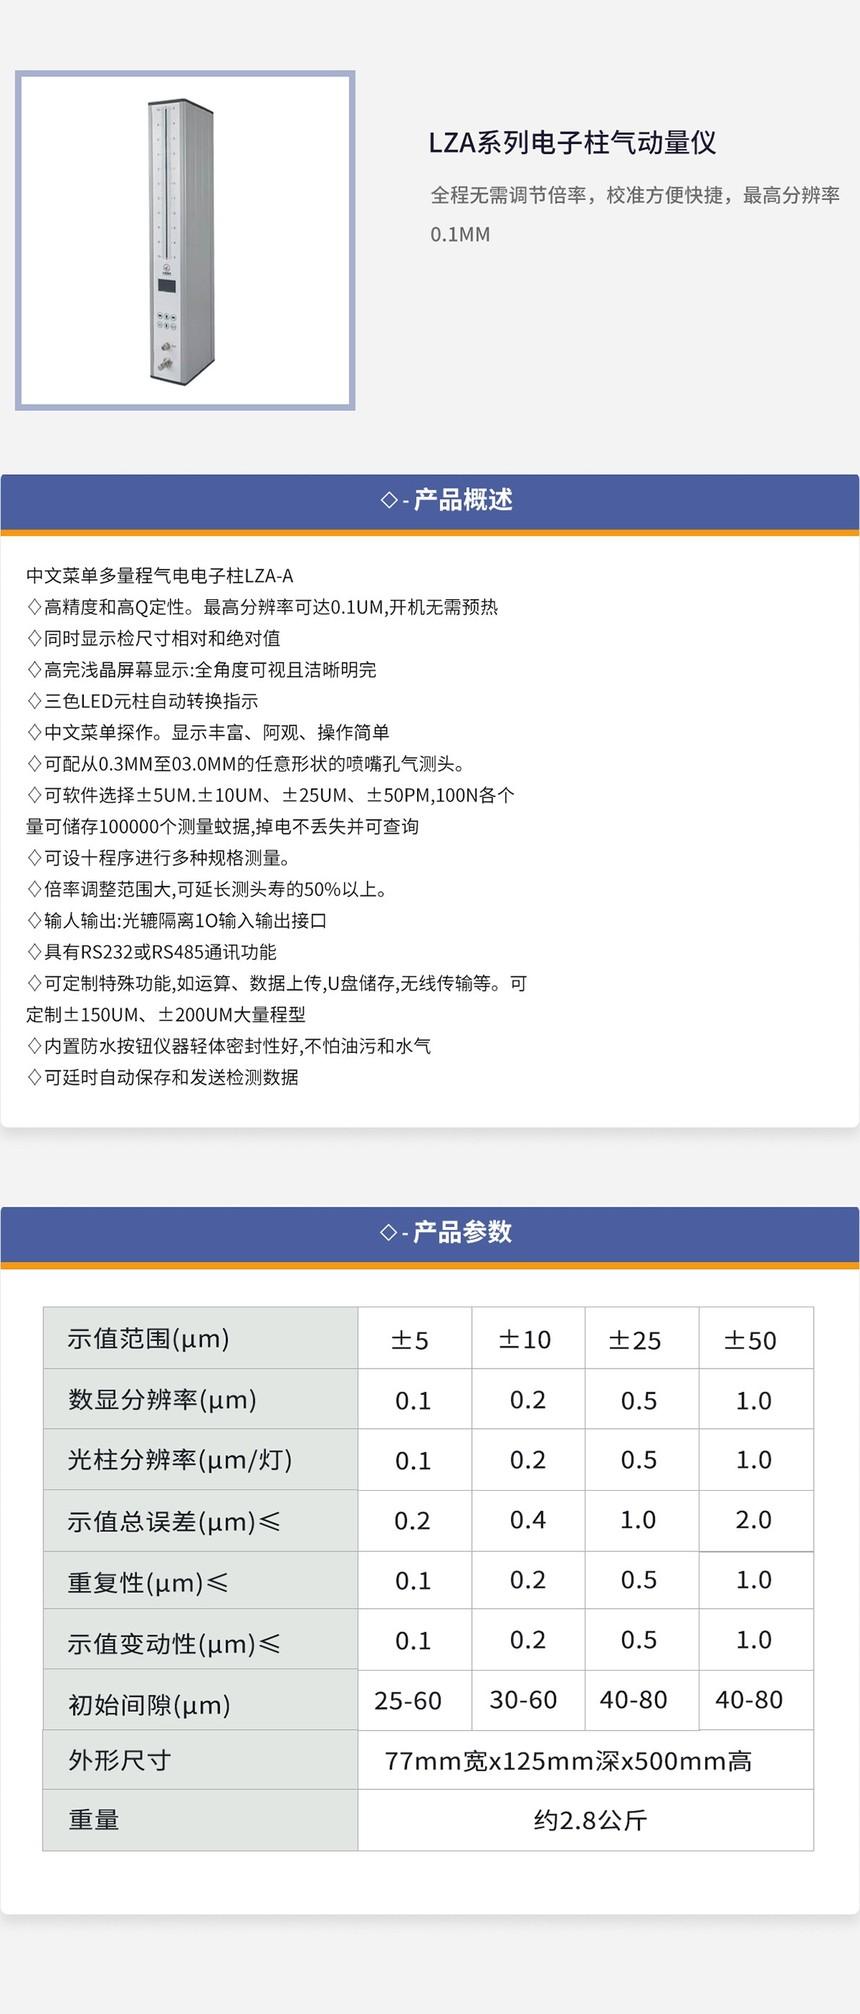 LZA系列电子柱气动量仪_02.jpg